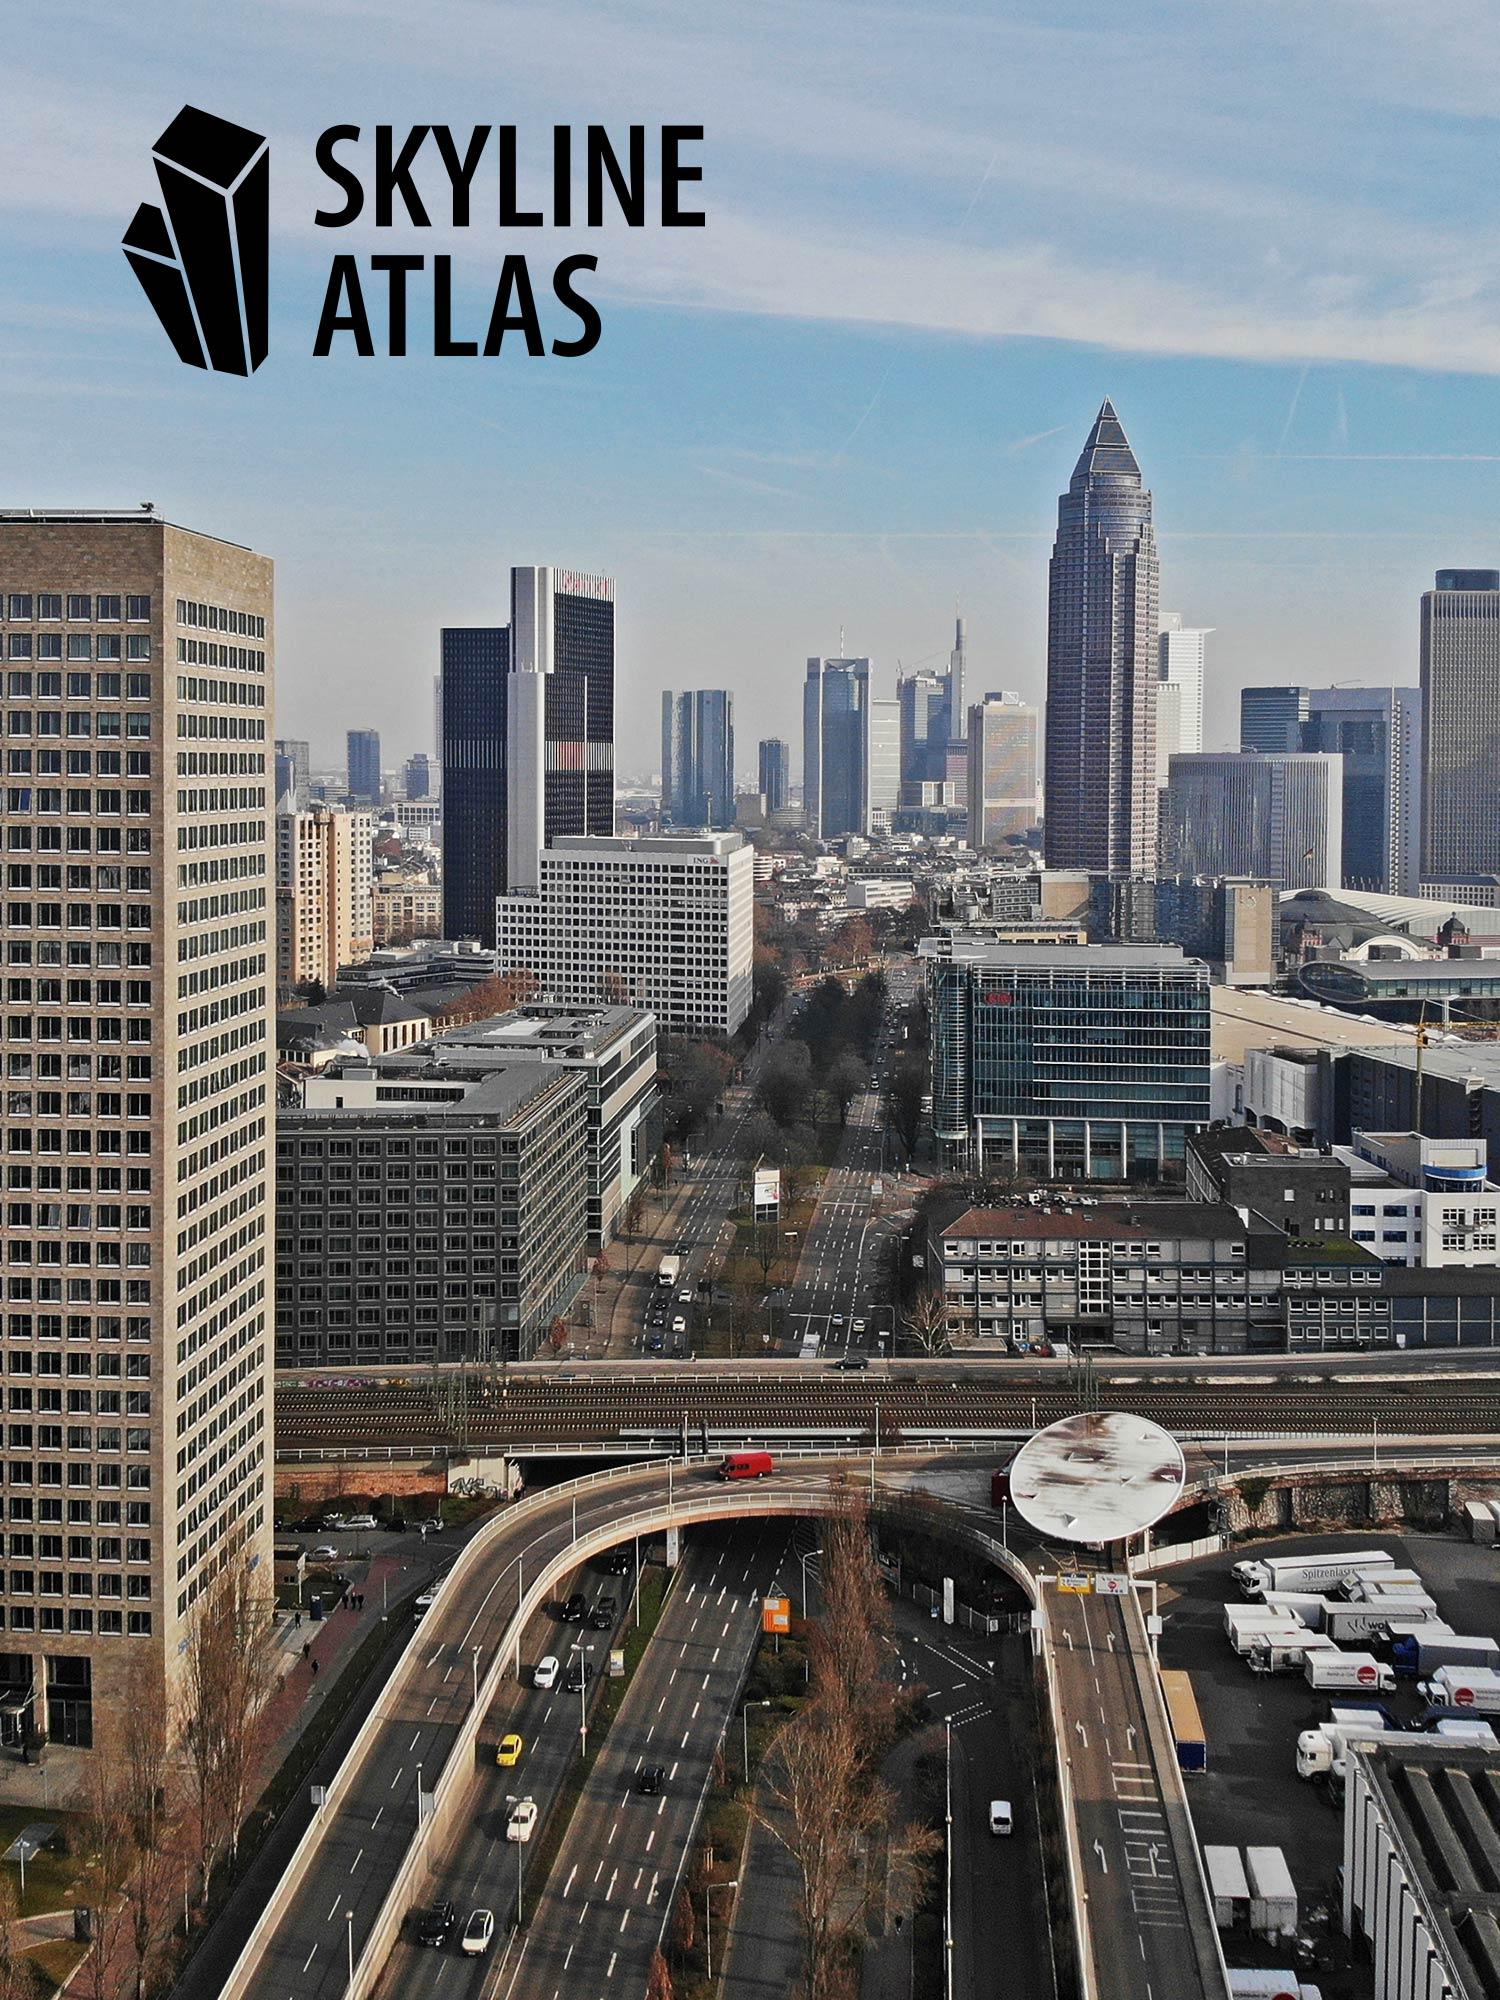 SKYLINE ATLAS - Architekturführer Frankfurt - Immobilienführer Frankfurt am Main - Panorama Frankfurt - Hochhäuser Drohnenaufahme